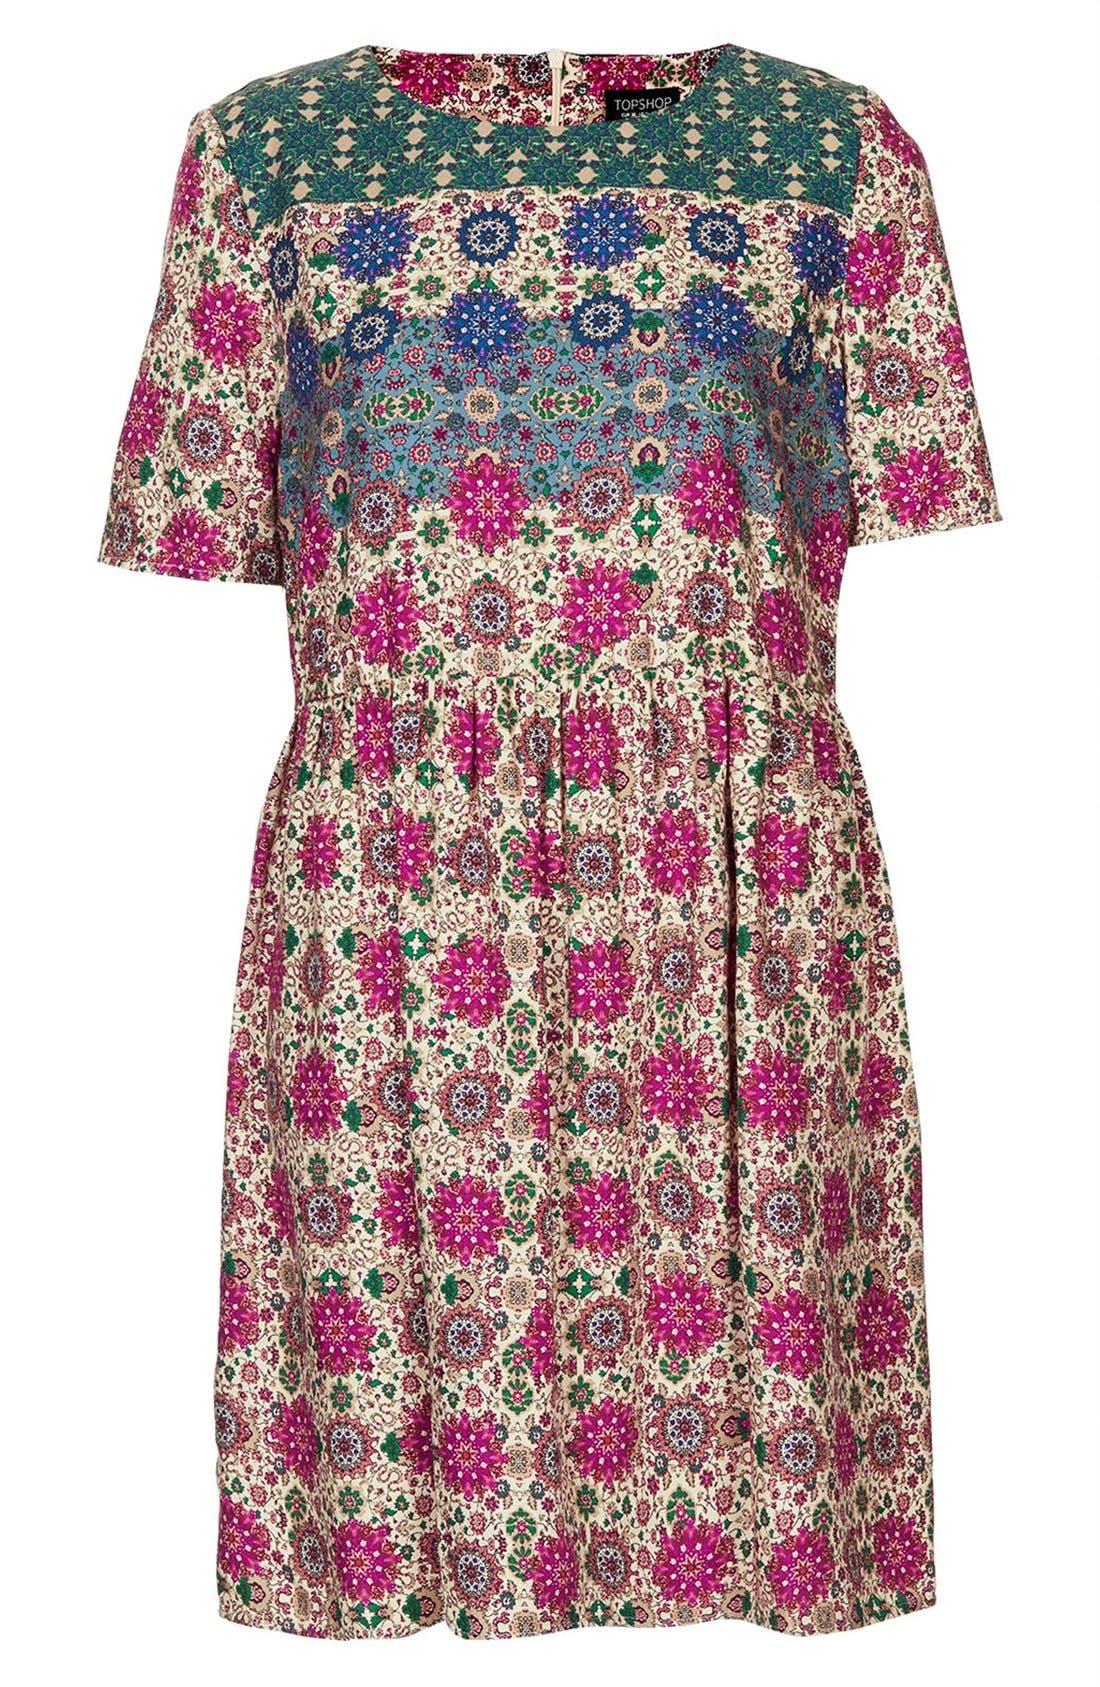 Alternate Image 3  - Topshop 'Folk Border' Print Day Dress